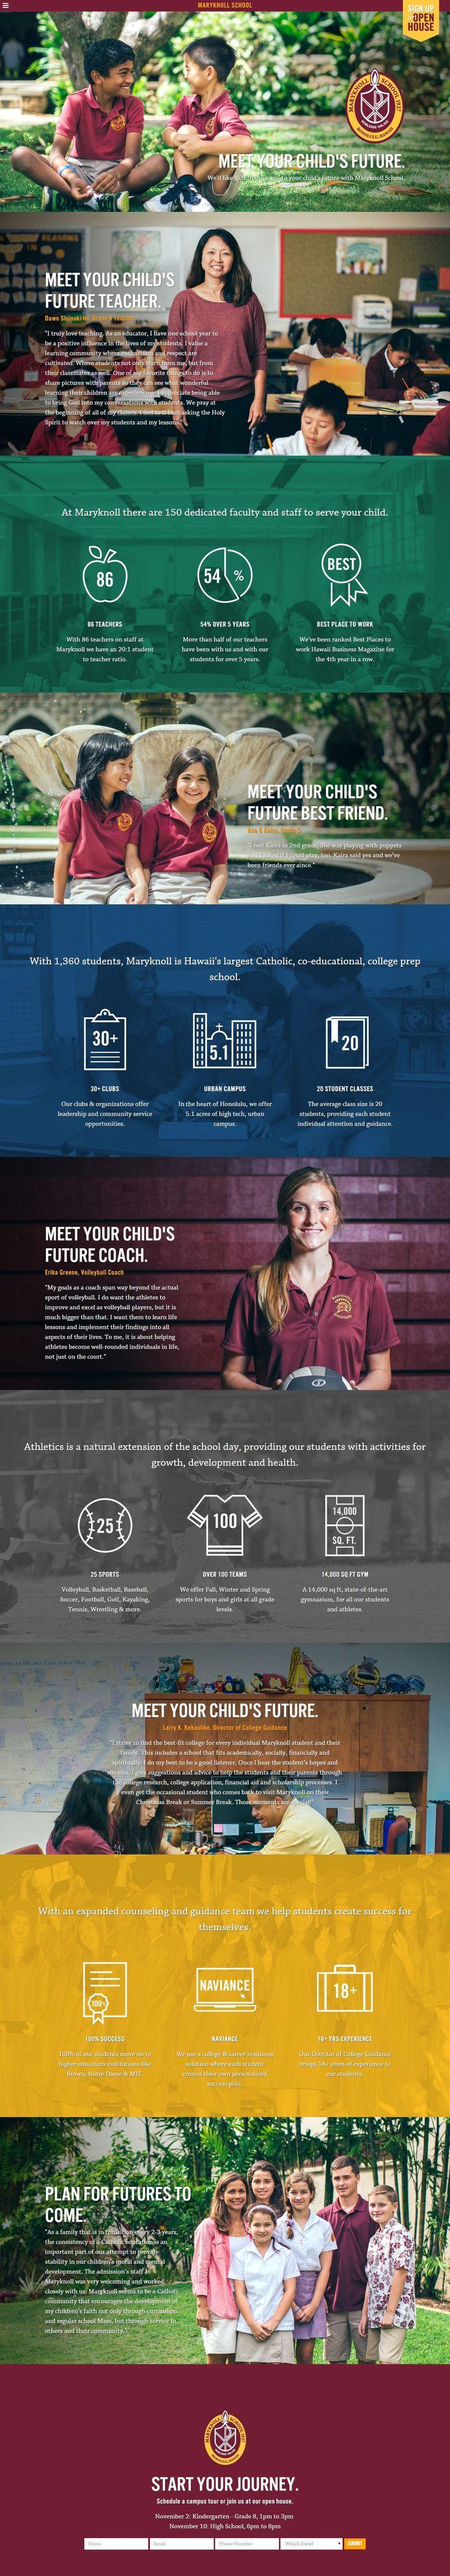 Meet Your Child's Future http://flattrendz.com/flat-design-gallery/meet-childs-future/